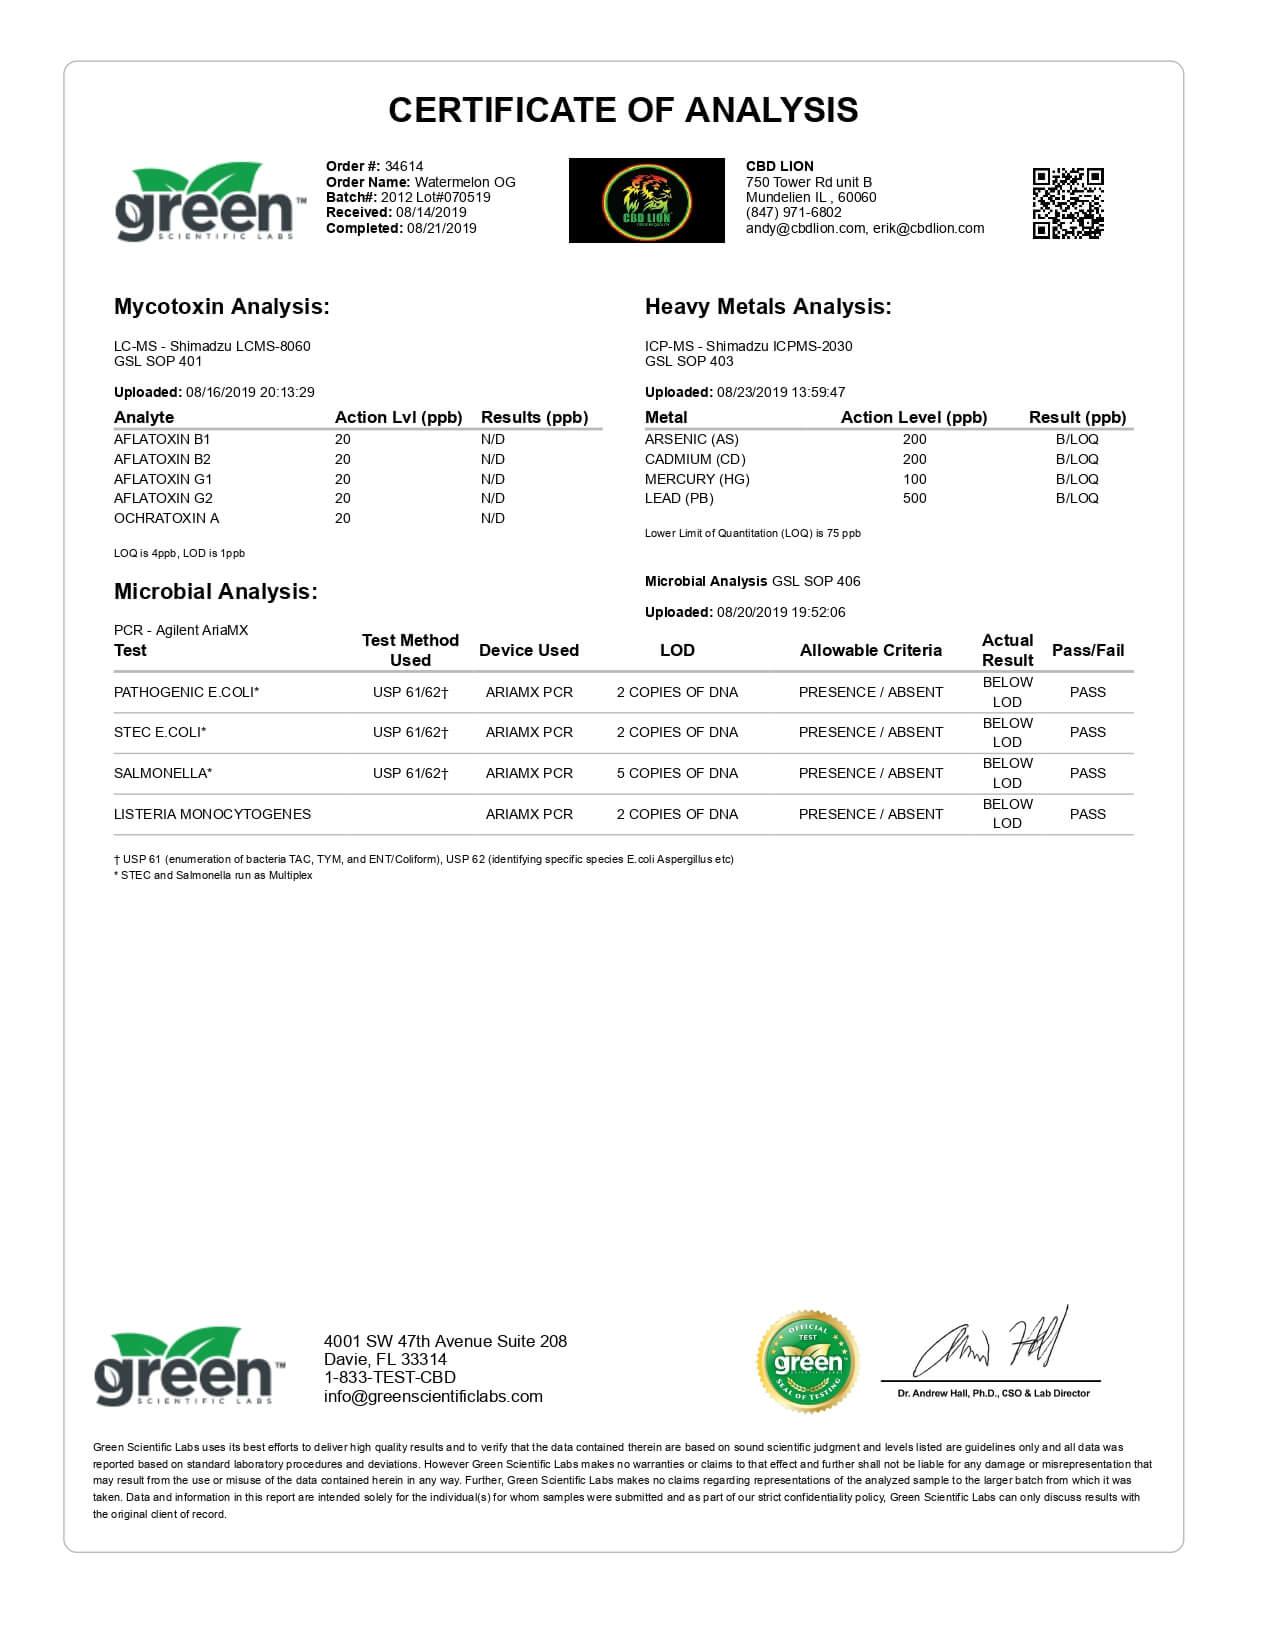 CBD Lion CBD Concentrate Watermelon OG Shatter 1g Lab Report